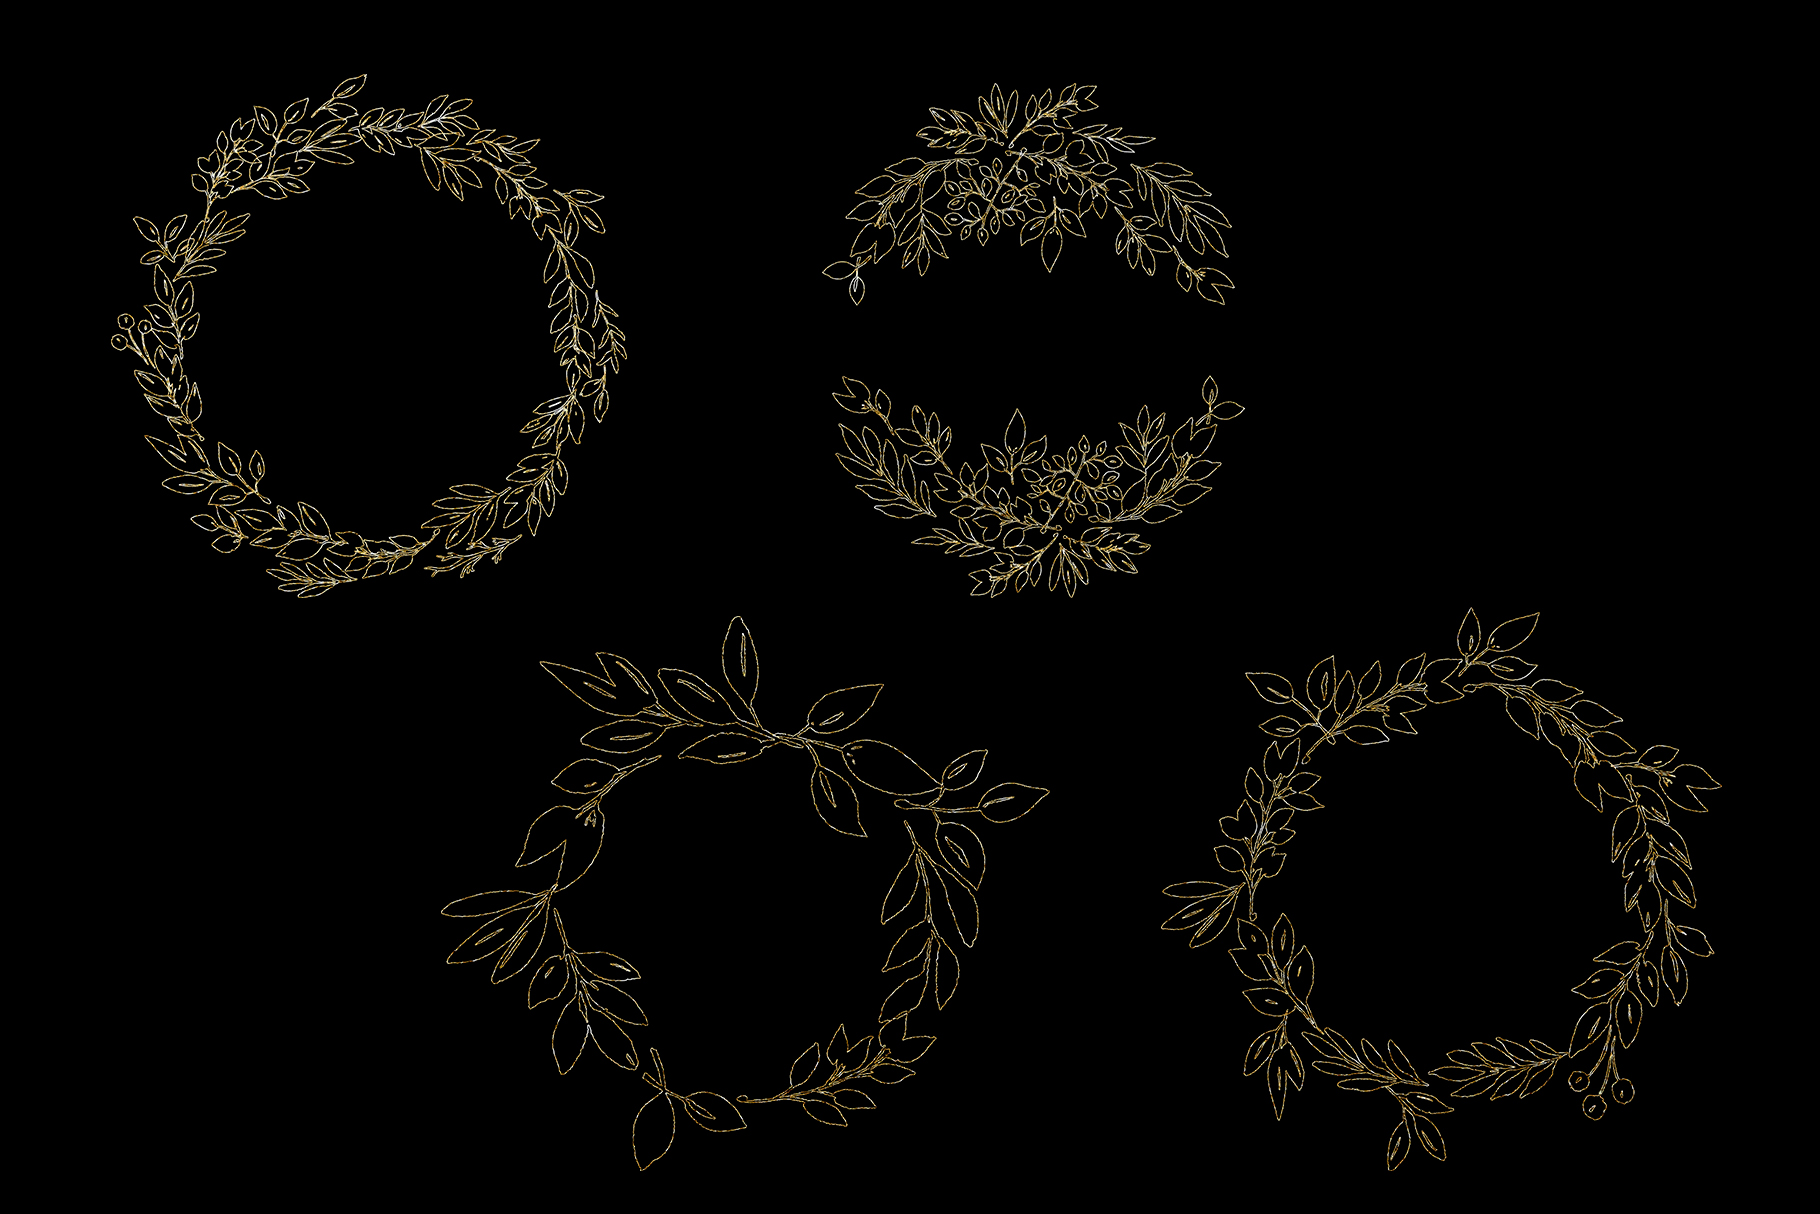 Foliage doodles clip art set, hand drawn foliage, hand drawn example image 7